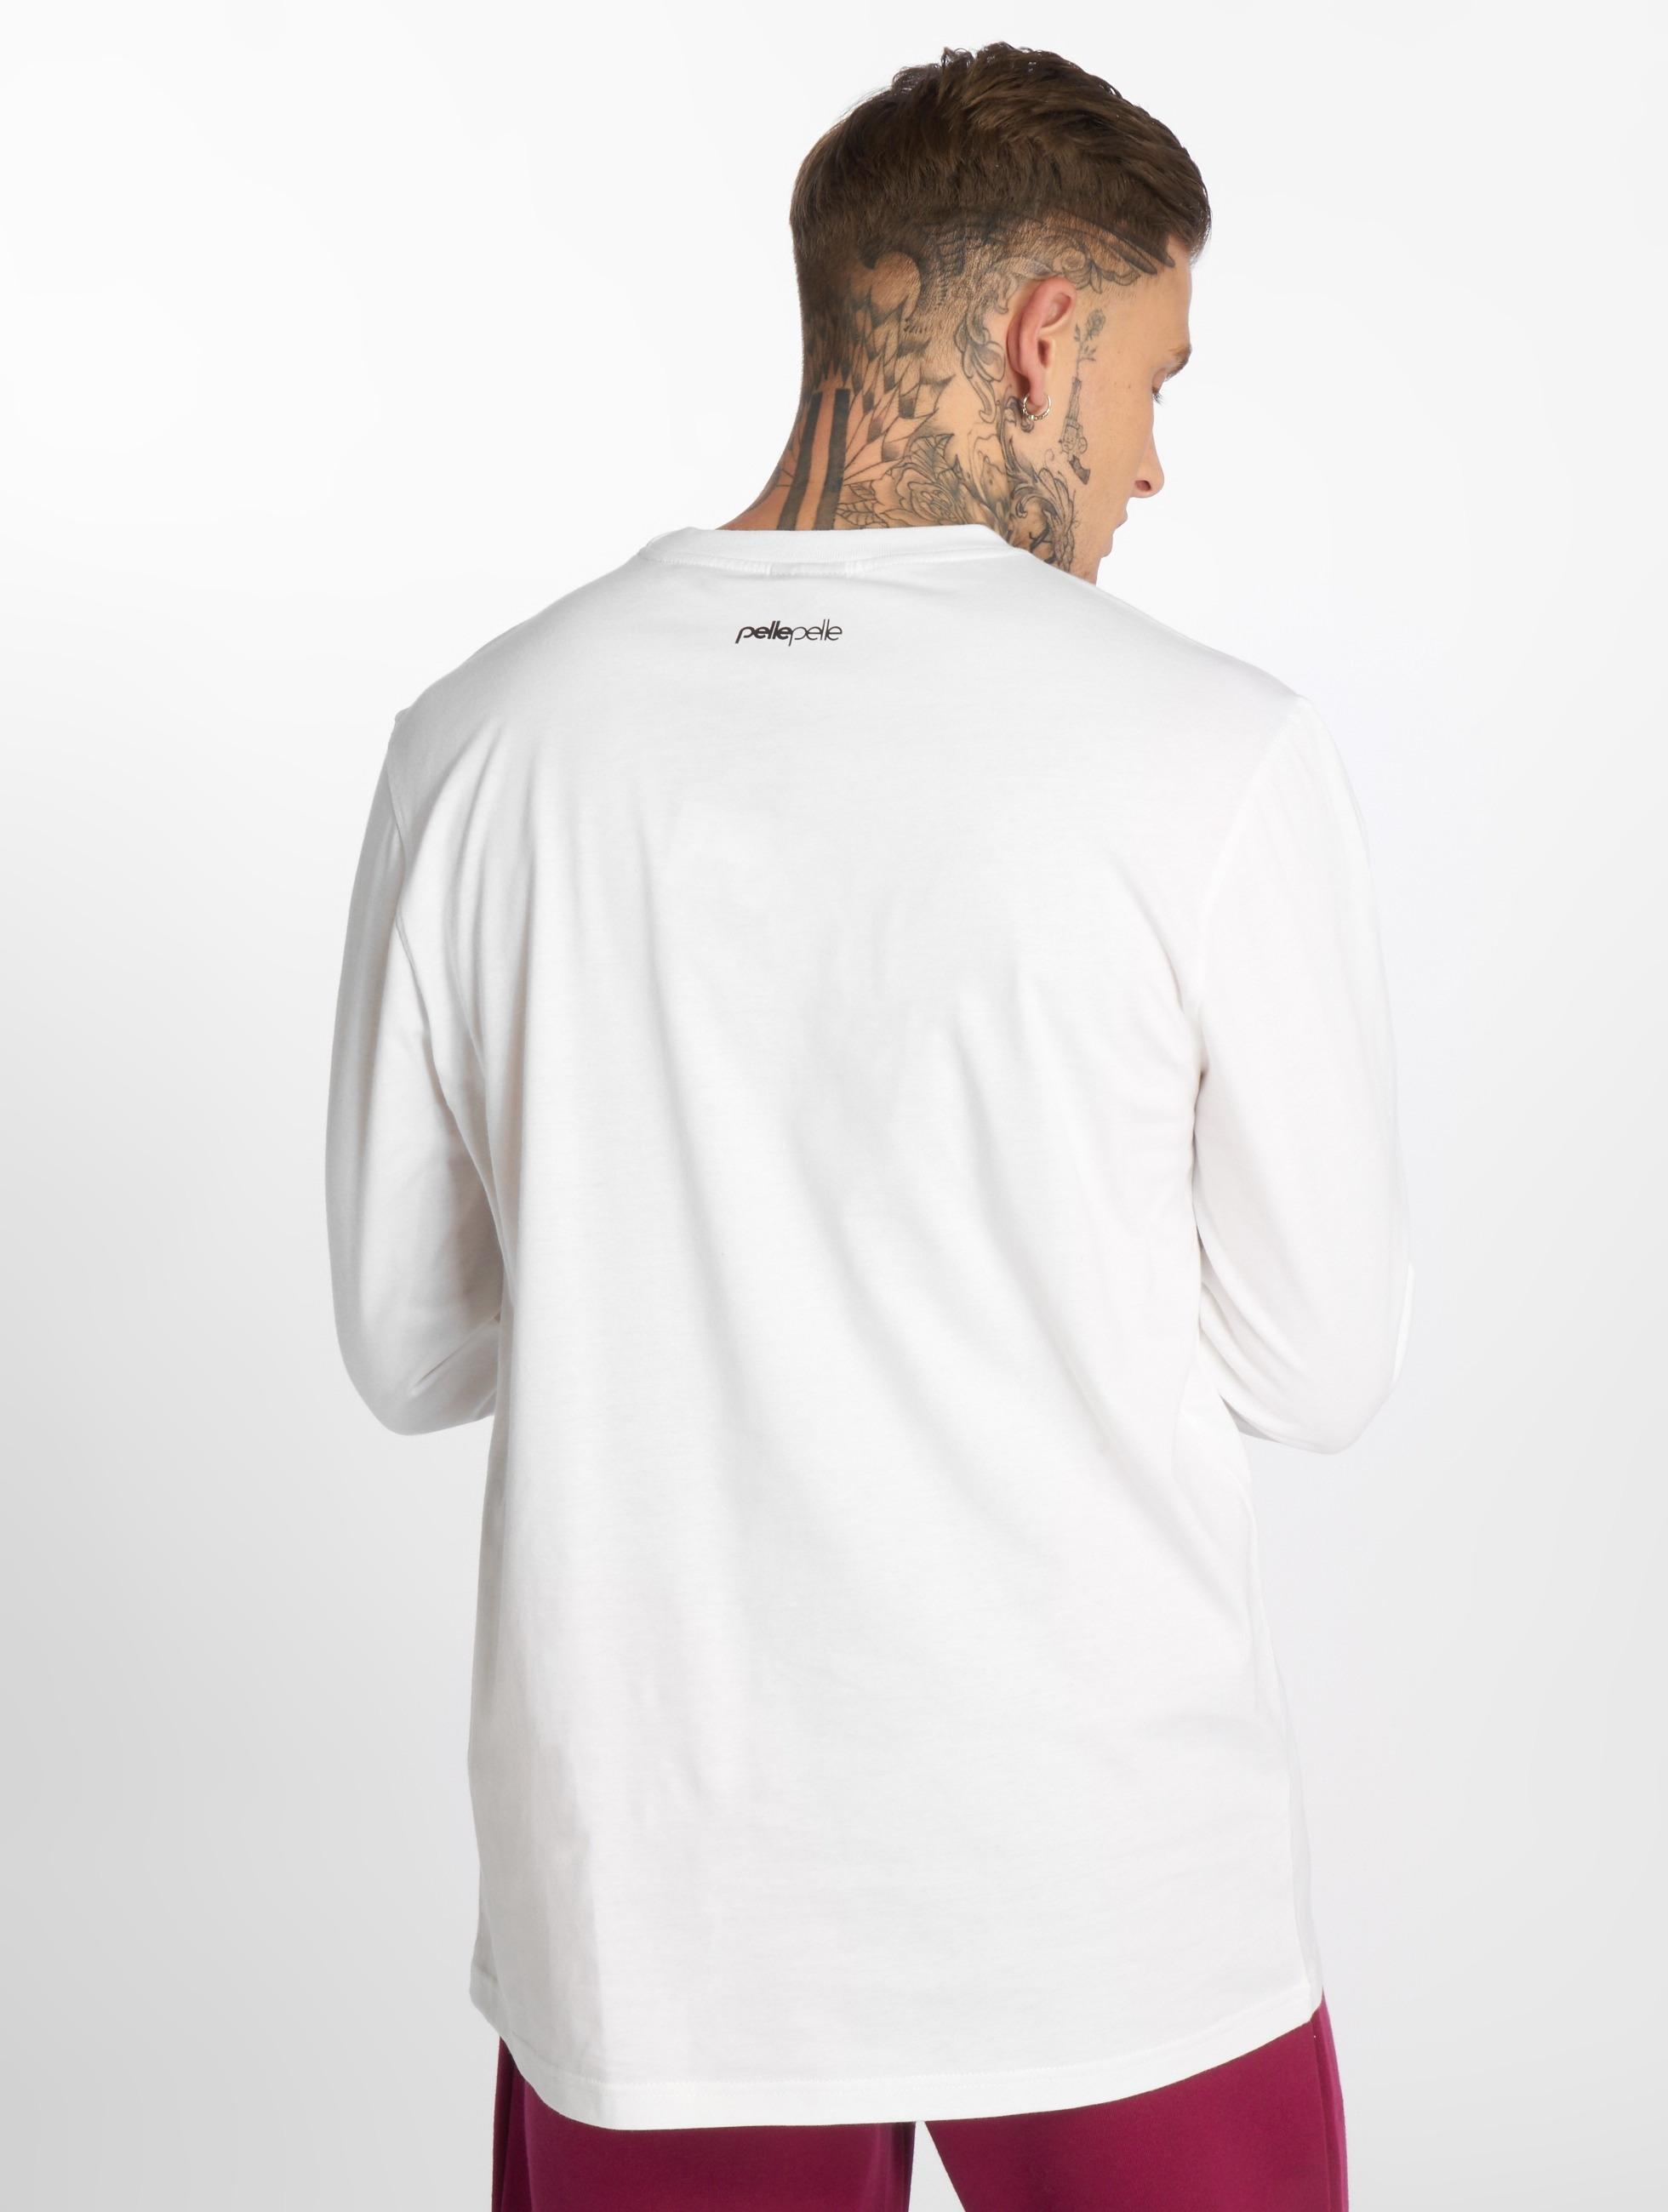 Basics Longues Hauts 2 Pelle Manches shirt T Back The Homme 5zqAvXA